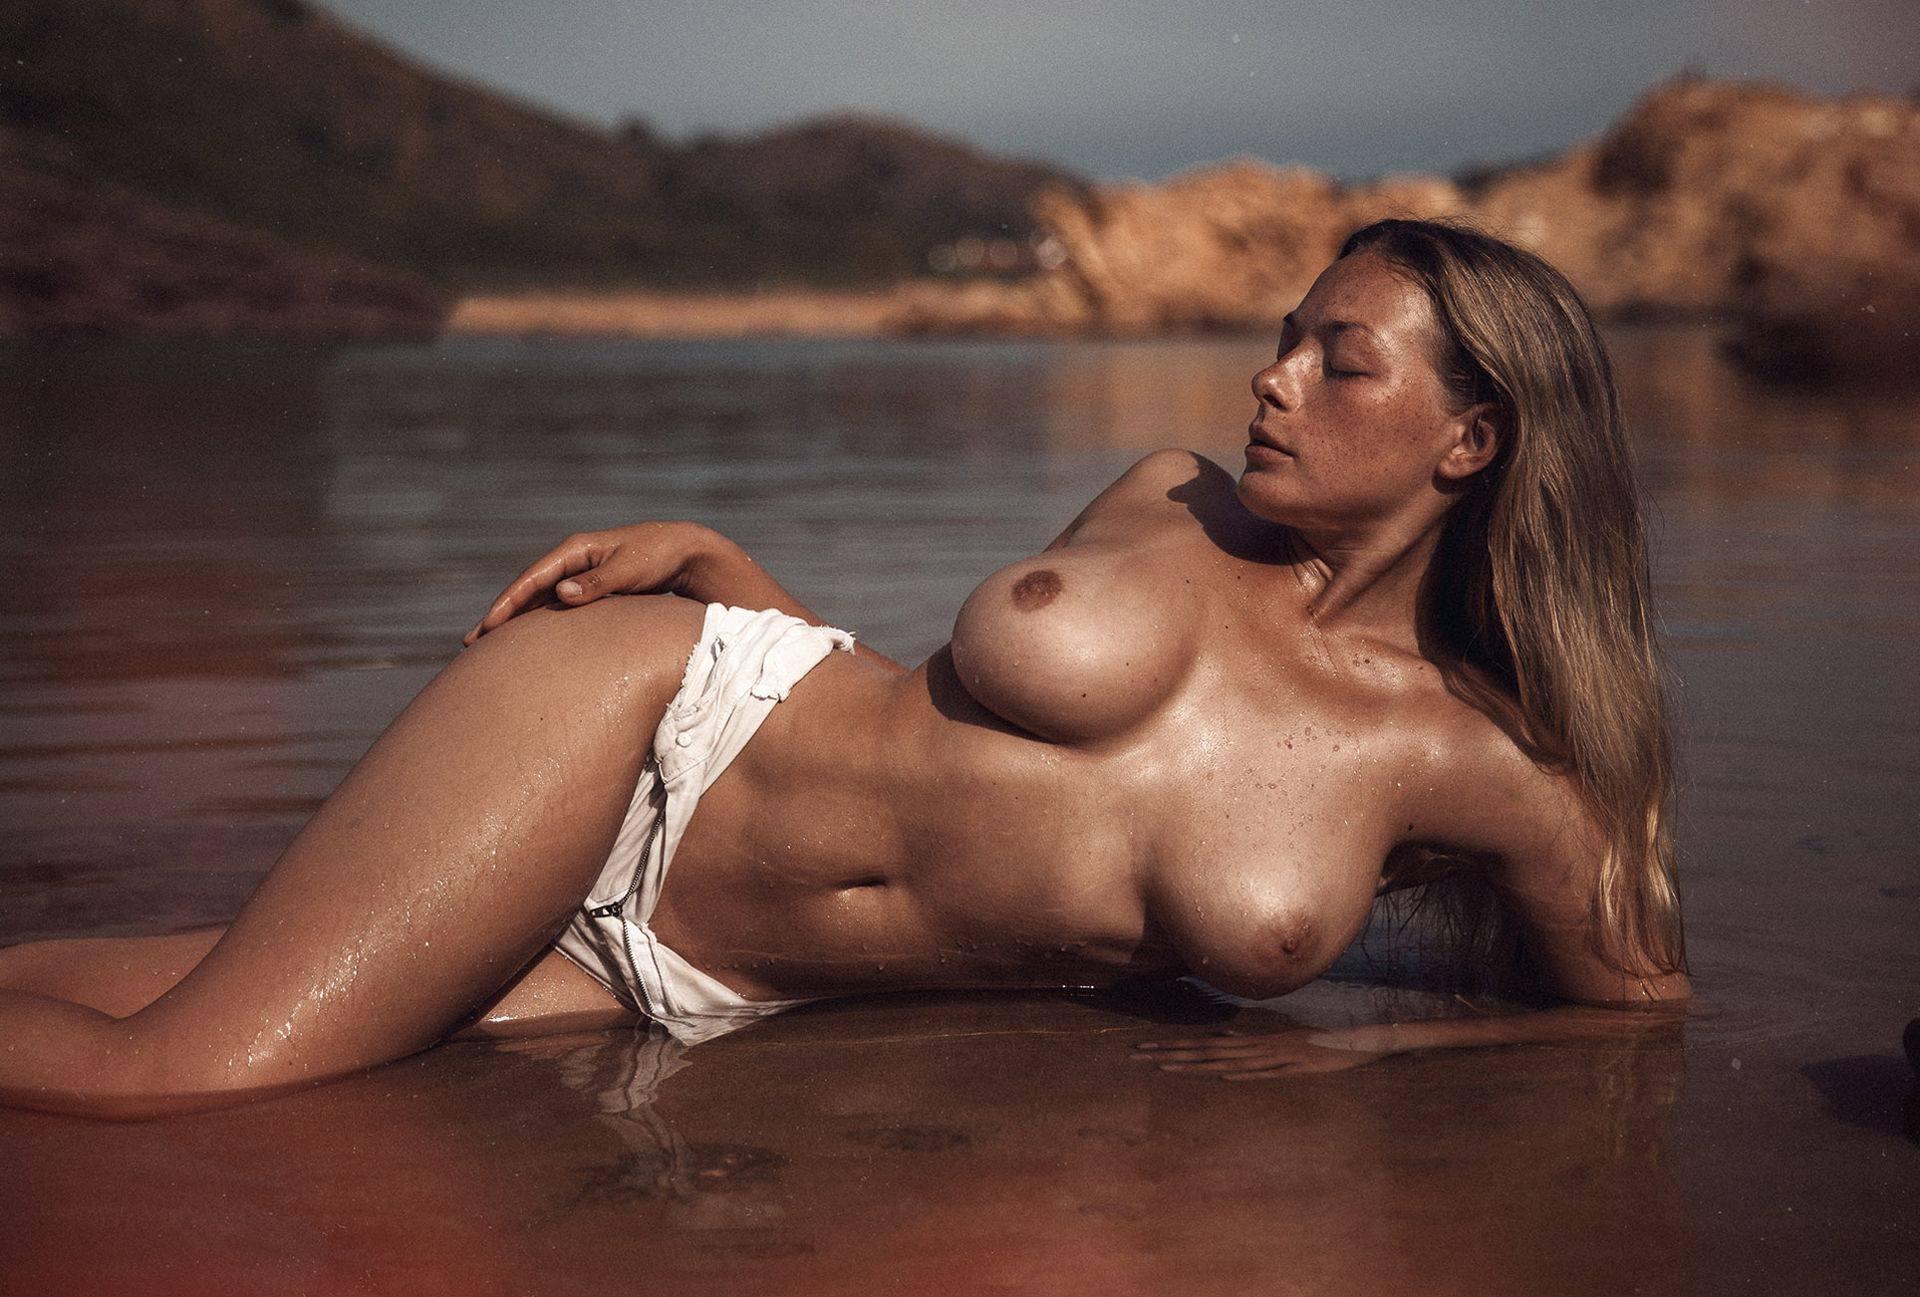 Olga Kobzar – Hot Big Boobs In Sexy Full Frontal Nude Photoshoot By Thomas Agatz (nsfw) 0018